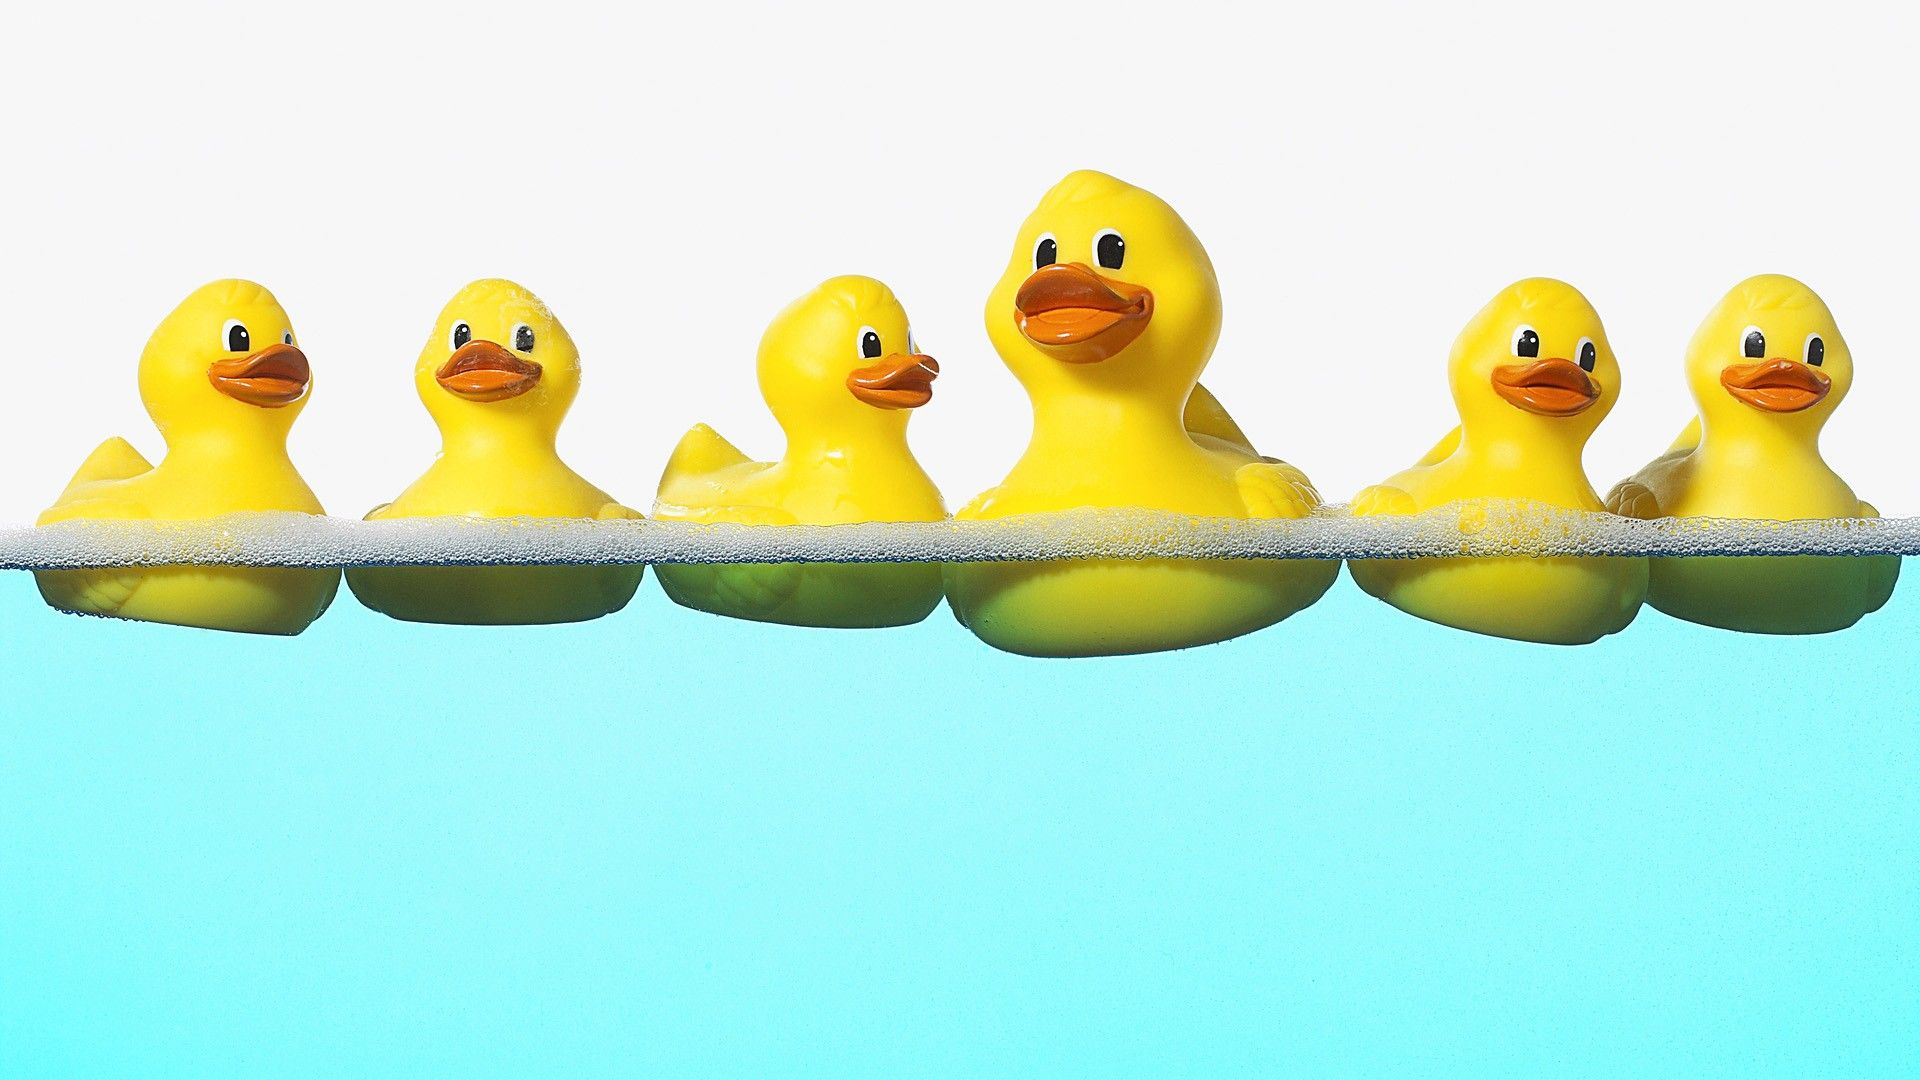 Download Rubber Ducks Wallpaper